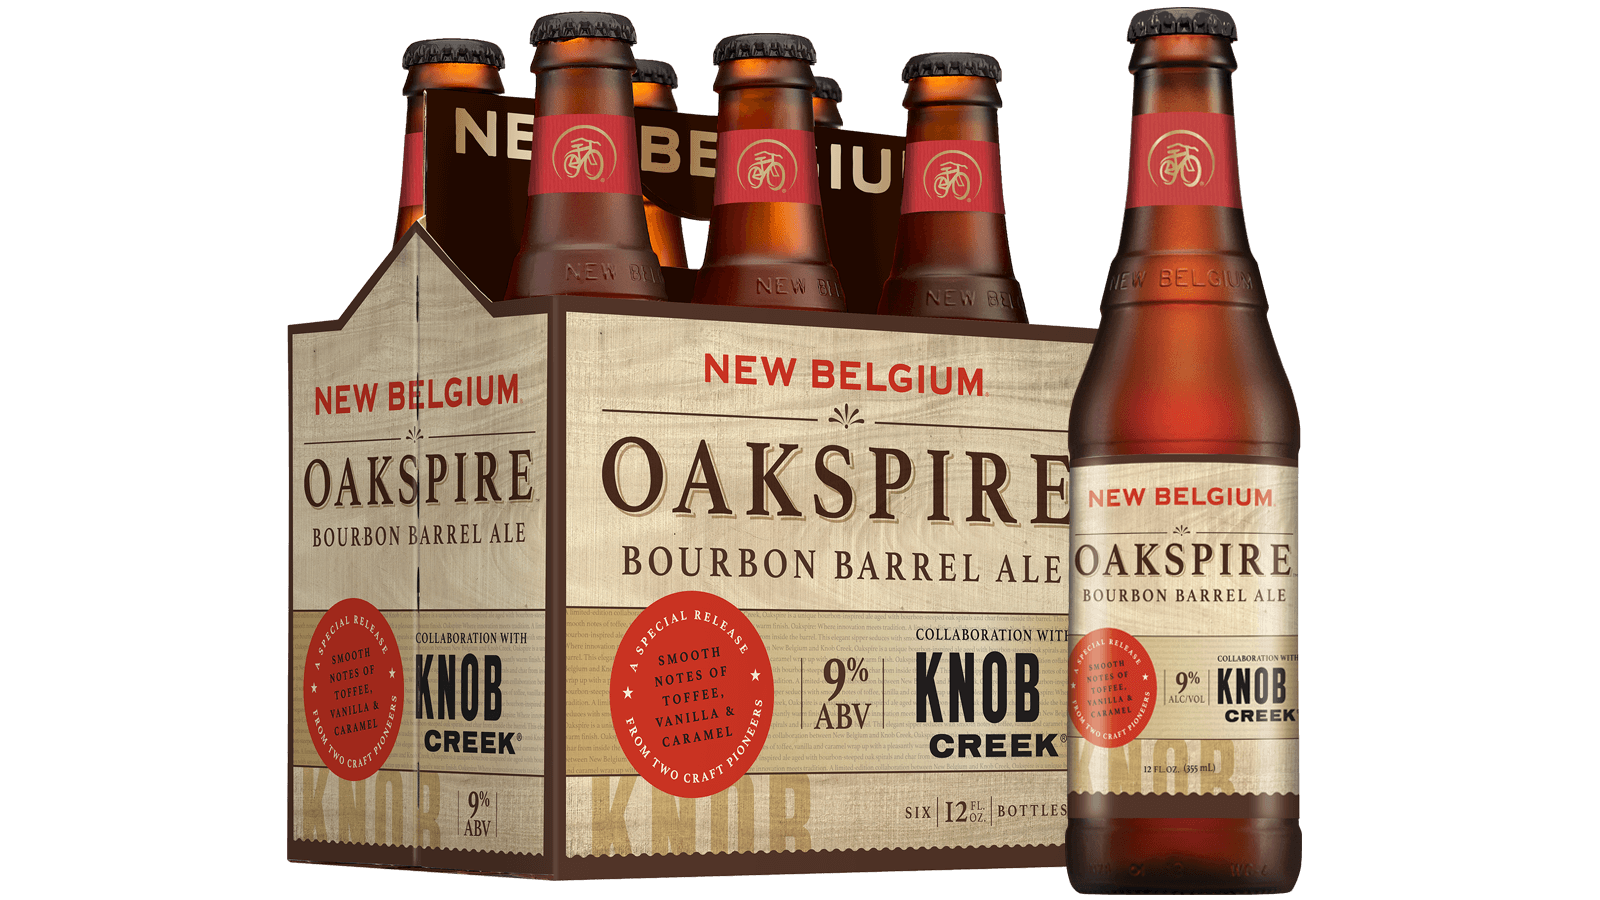 oakspire bourbon barrel ale new belgium brewing